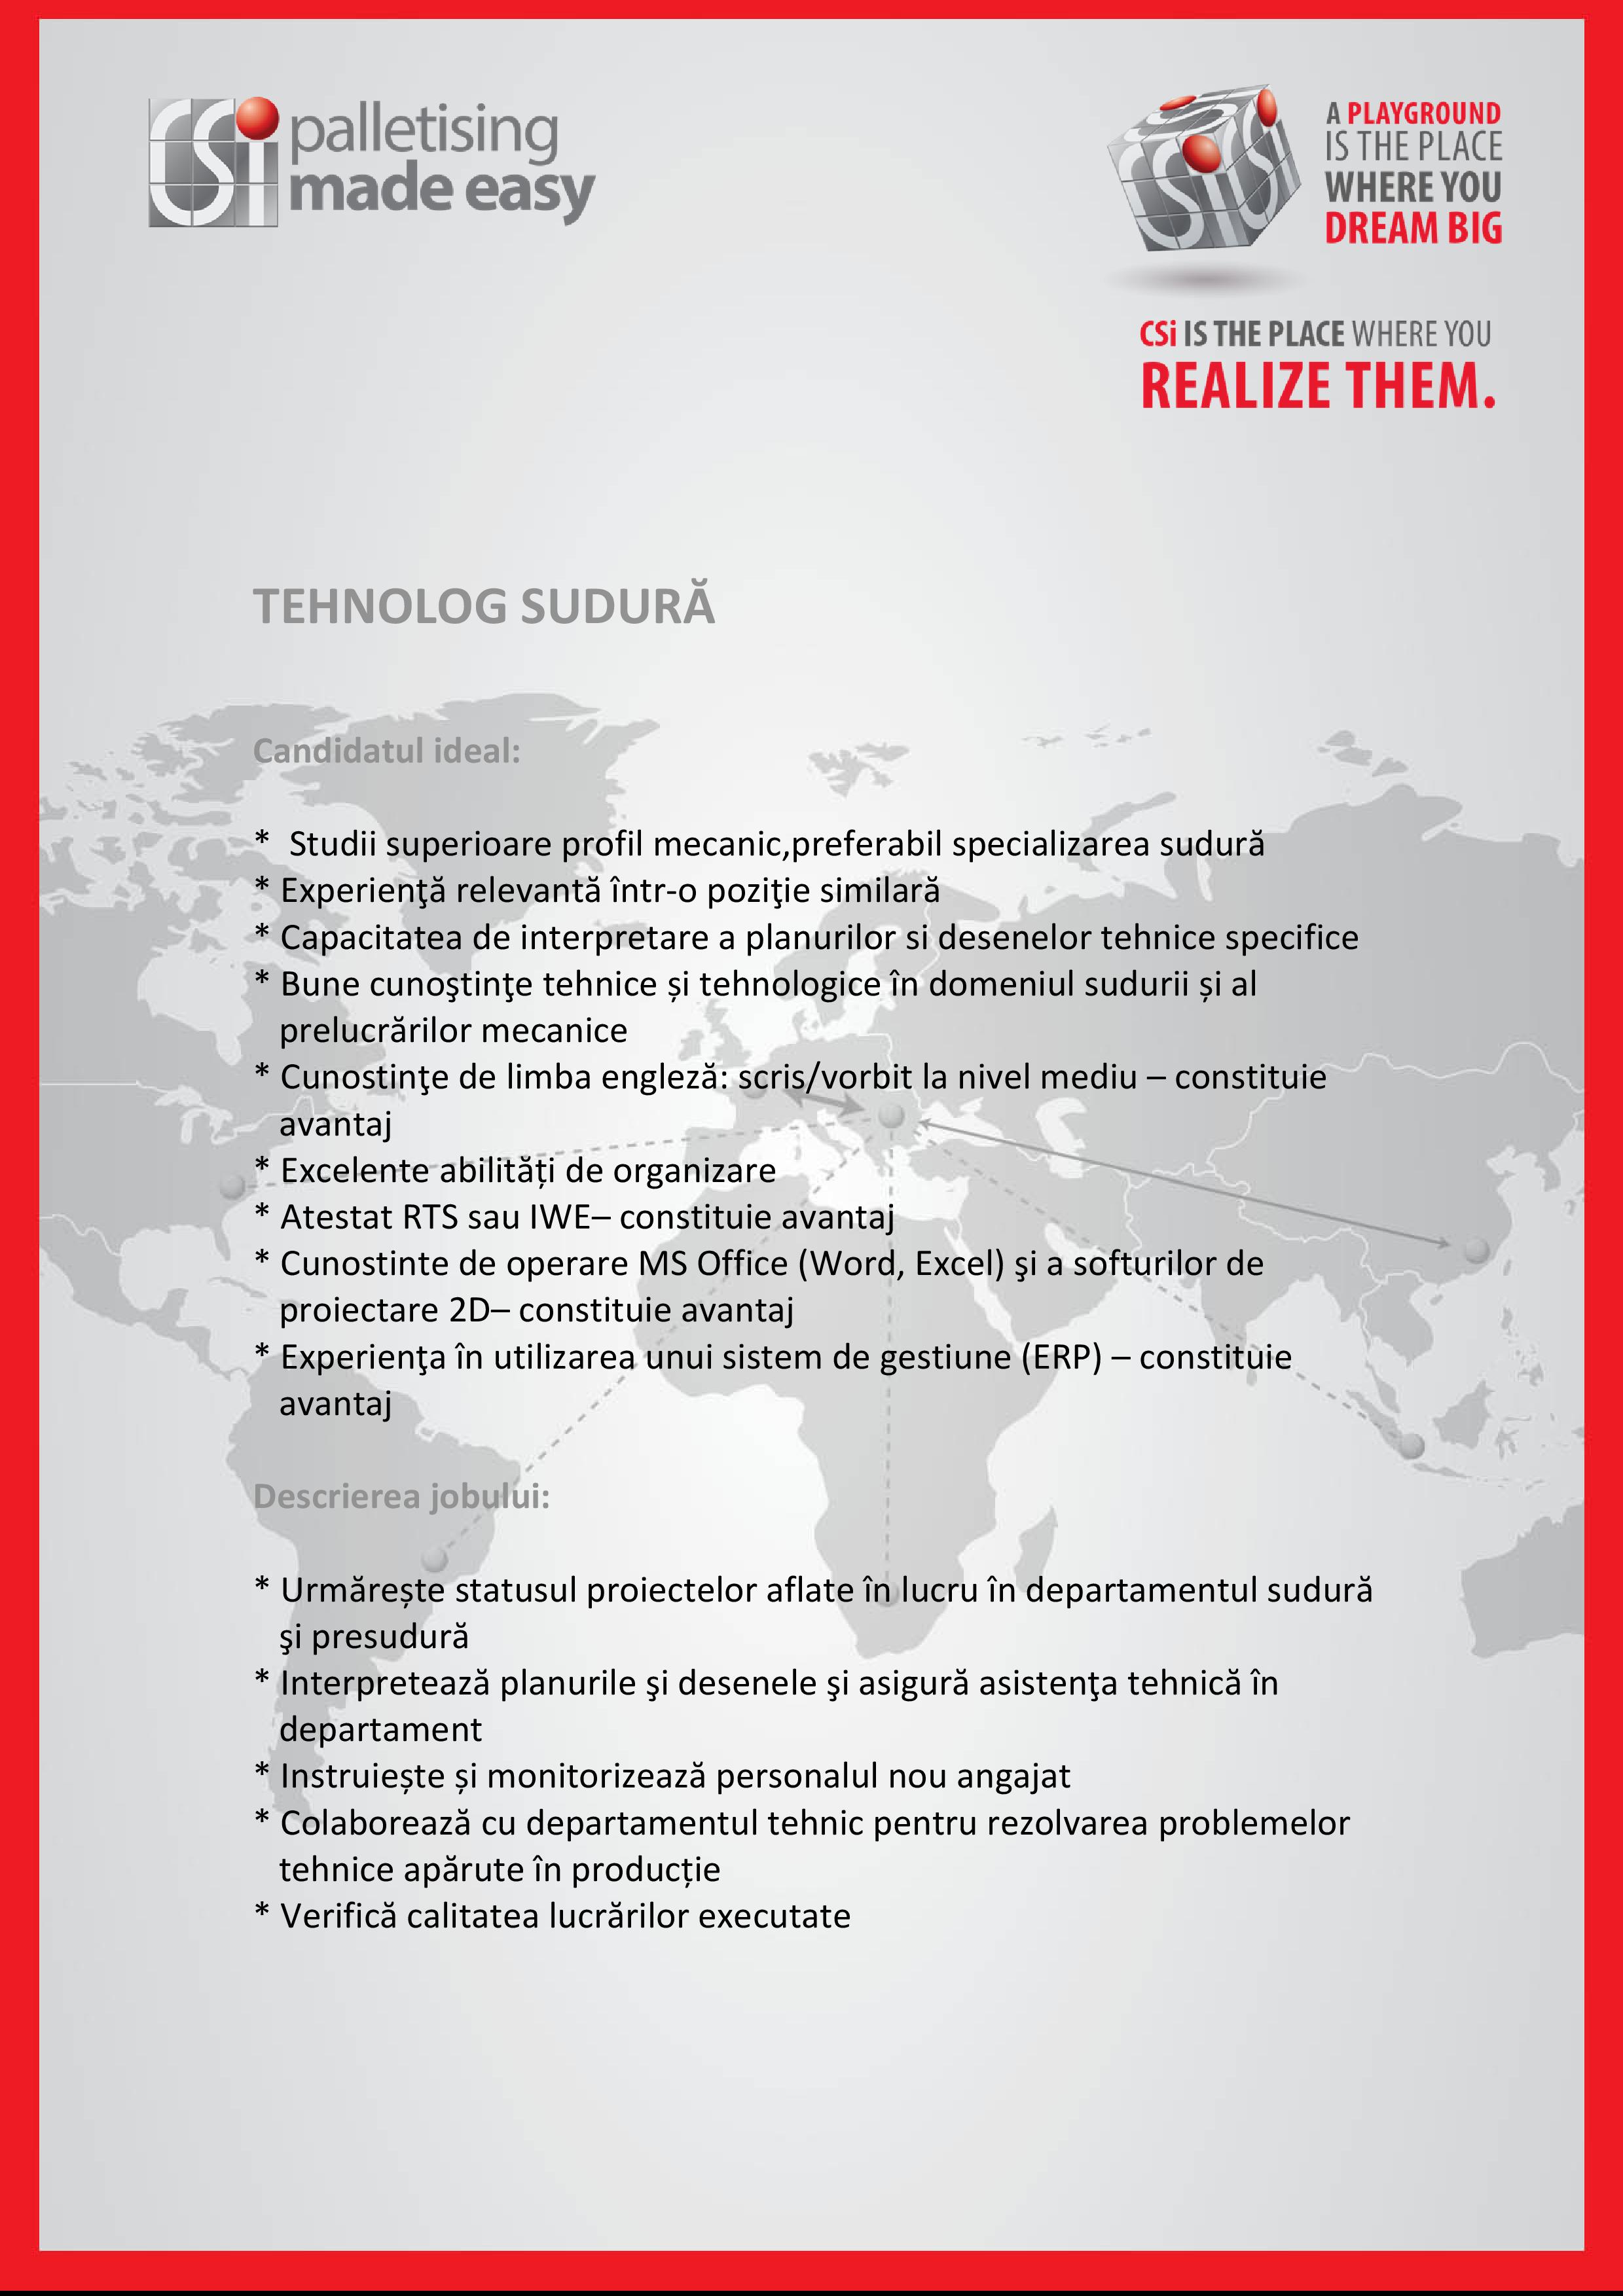 CSi layout ad angajare tehnolog sudura (2)